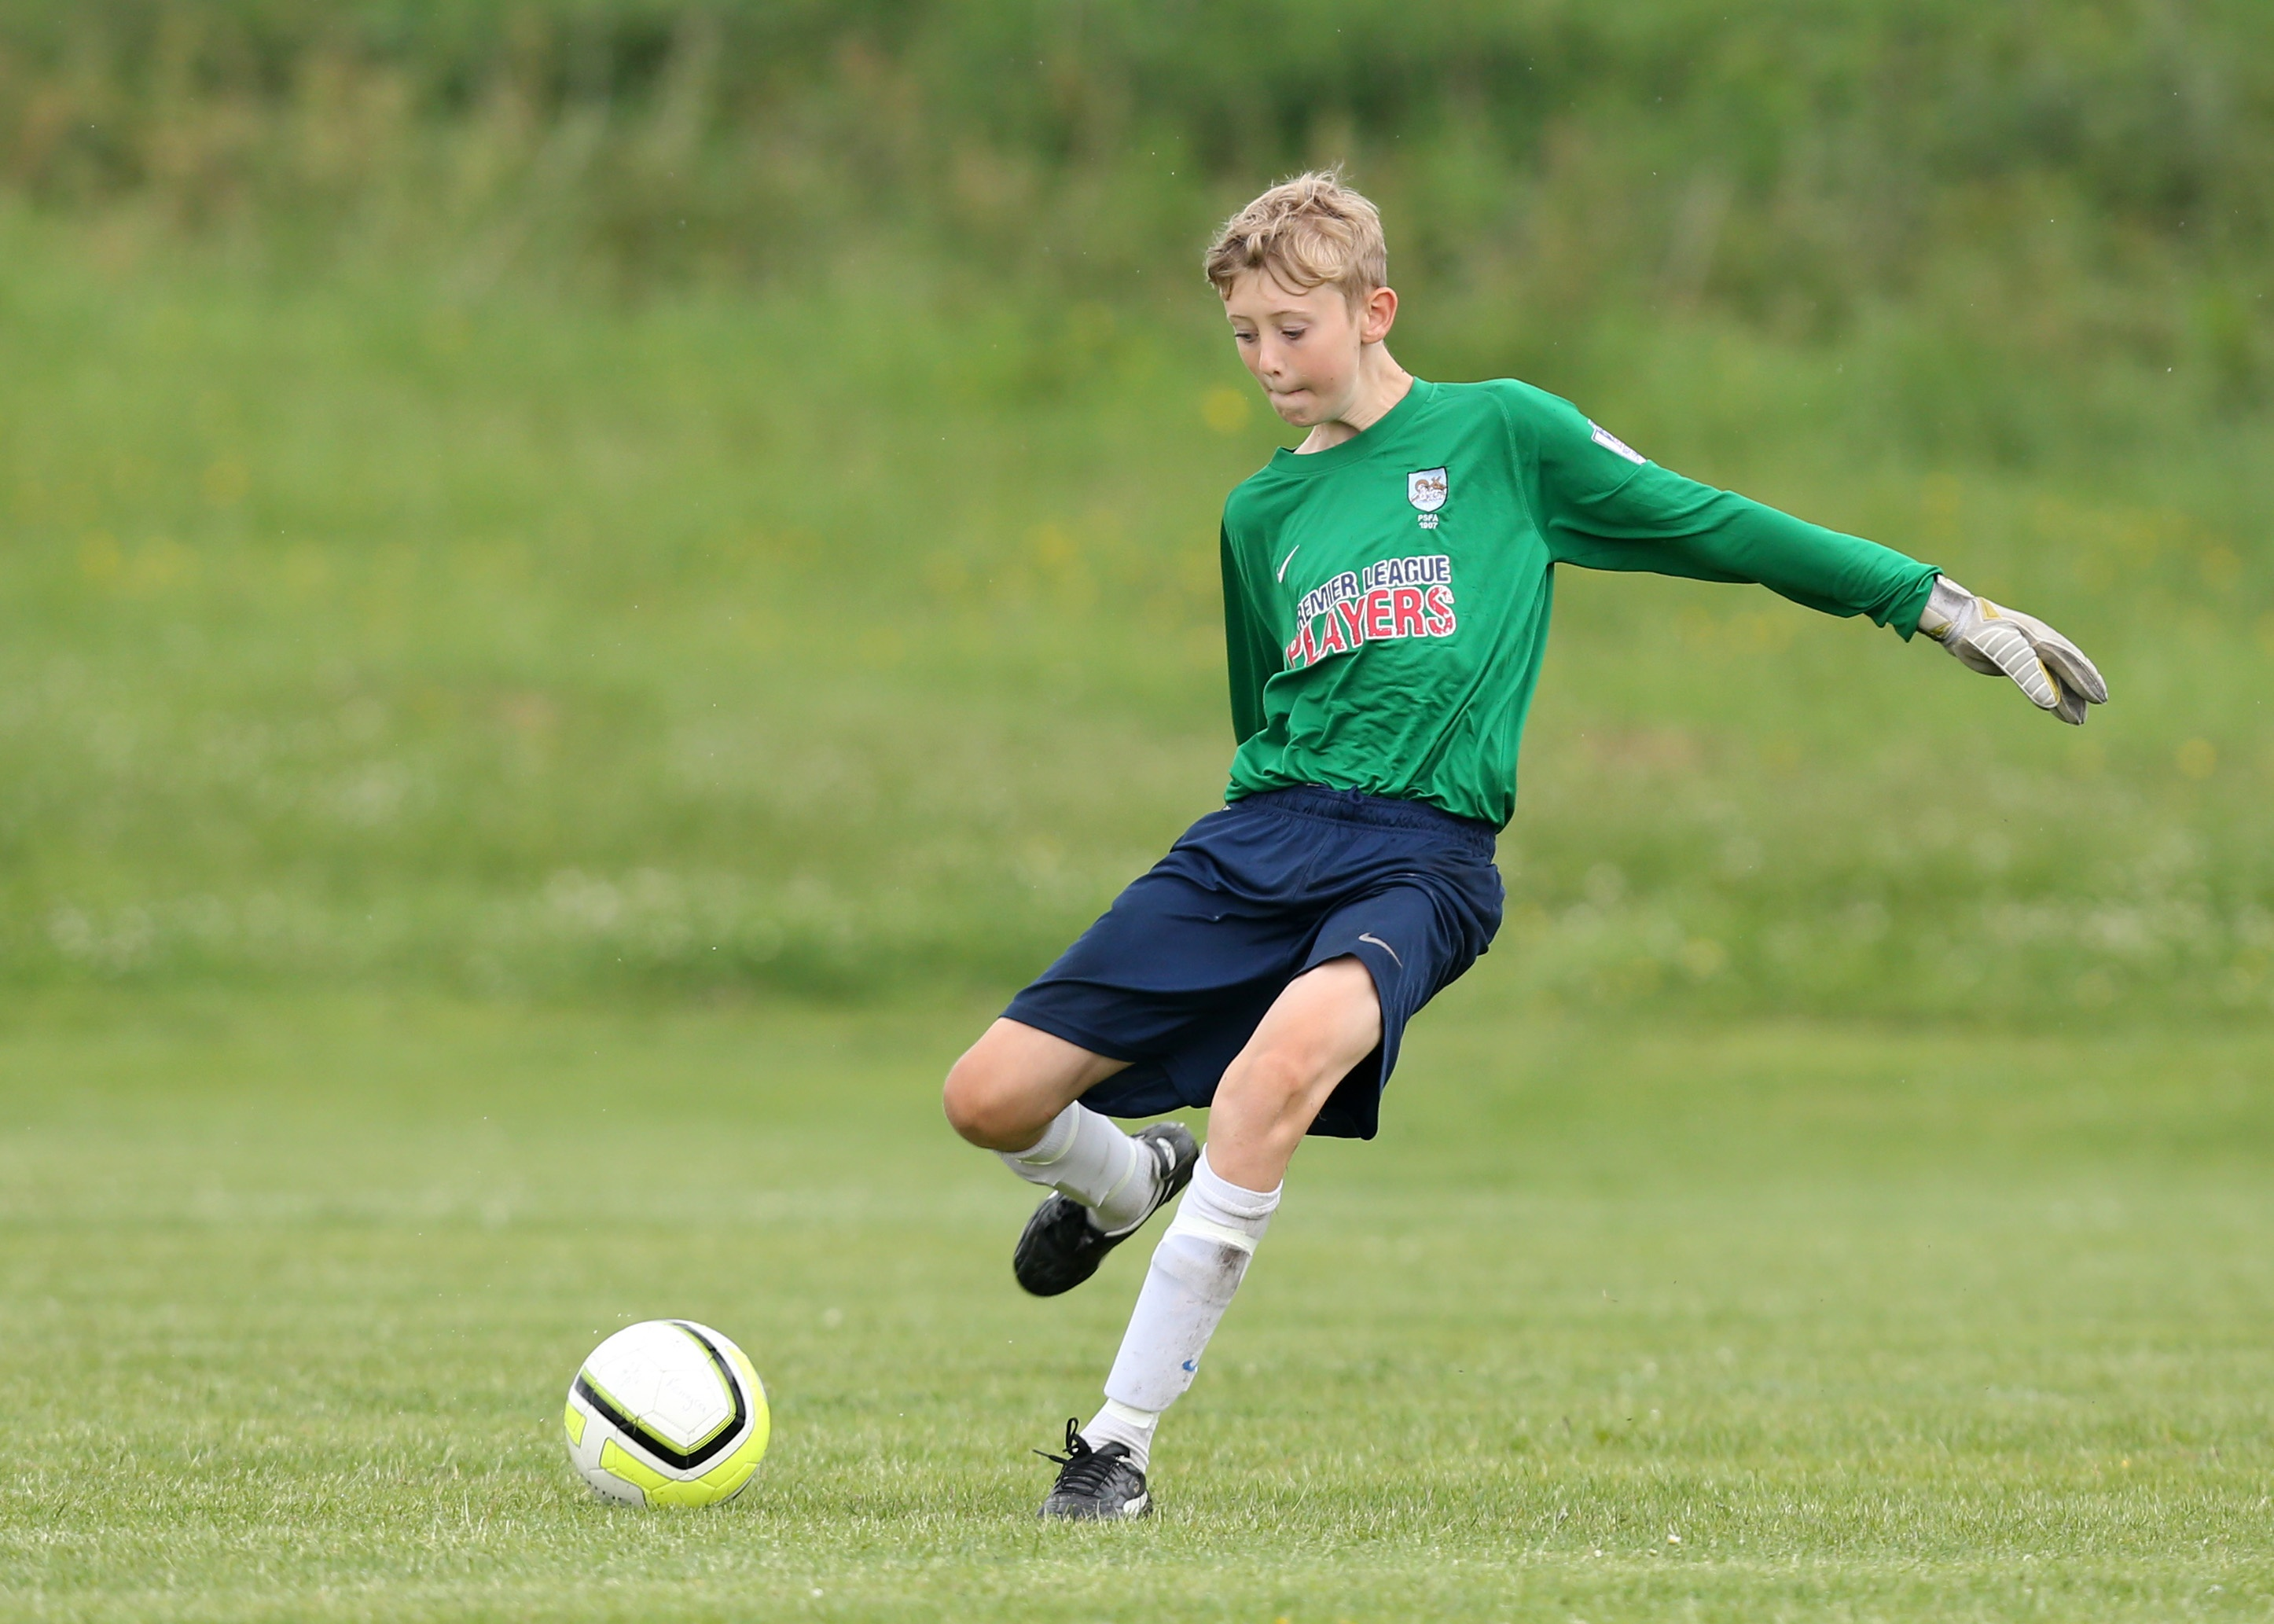 Football law changes - goal kick pic 1